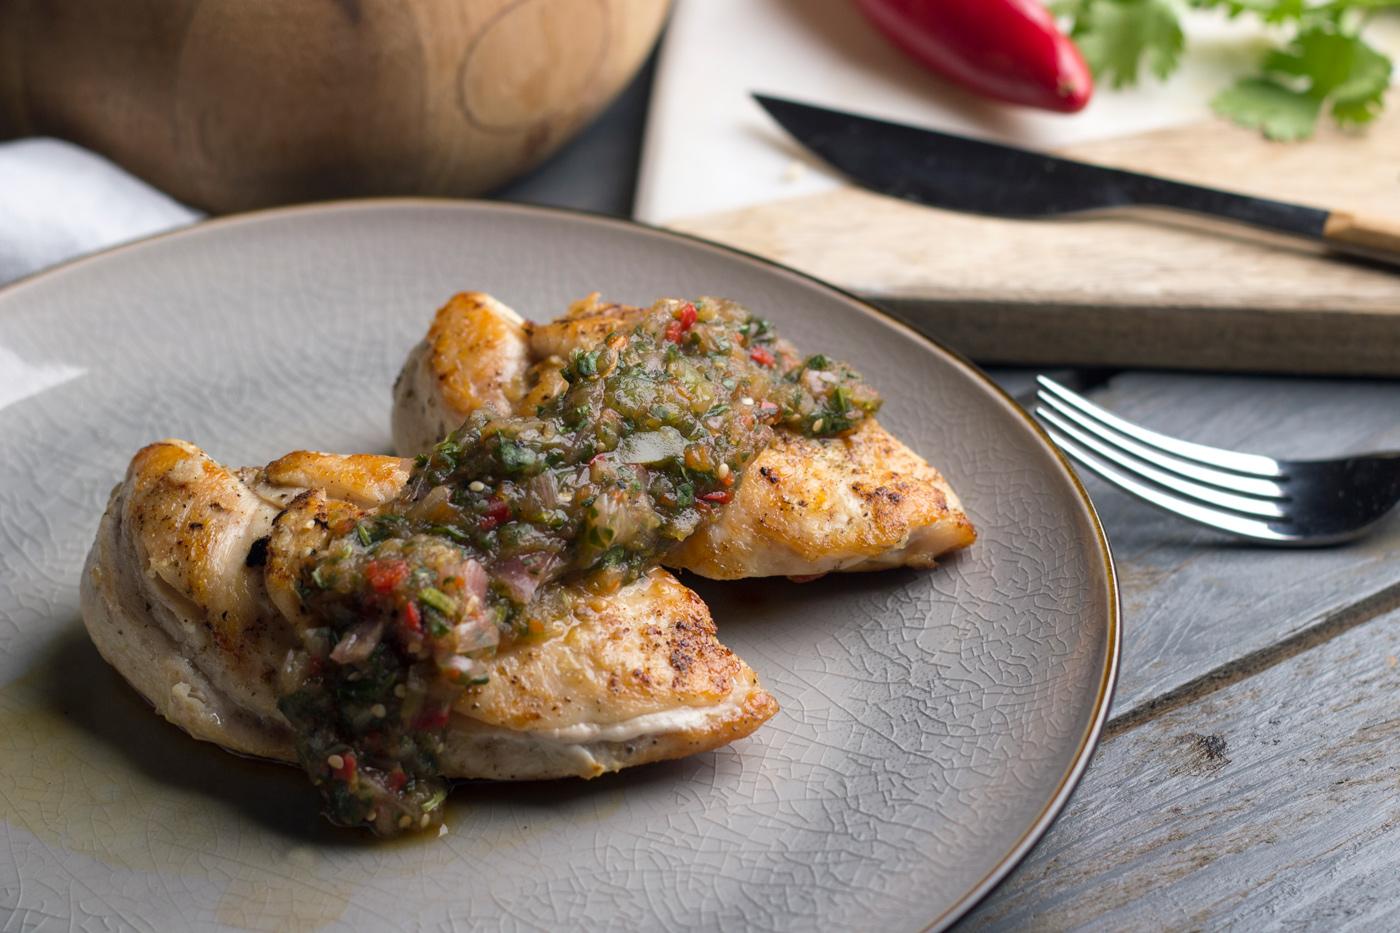 Chicken Breast with Tomatillo Salsa Verde